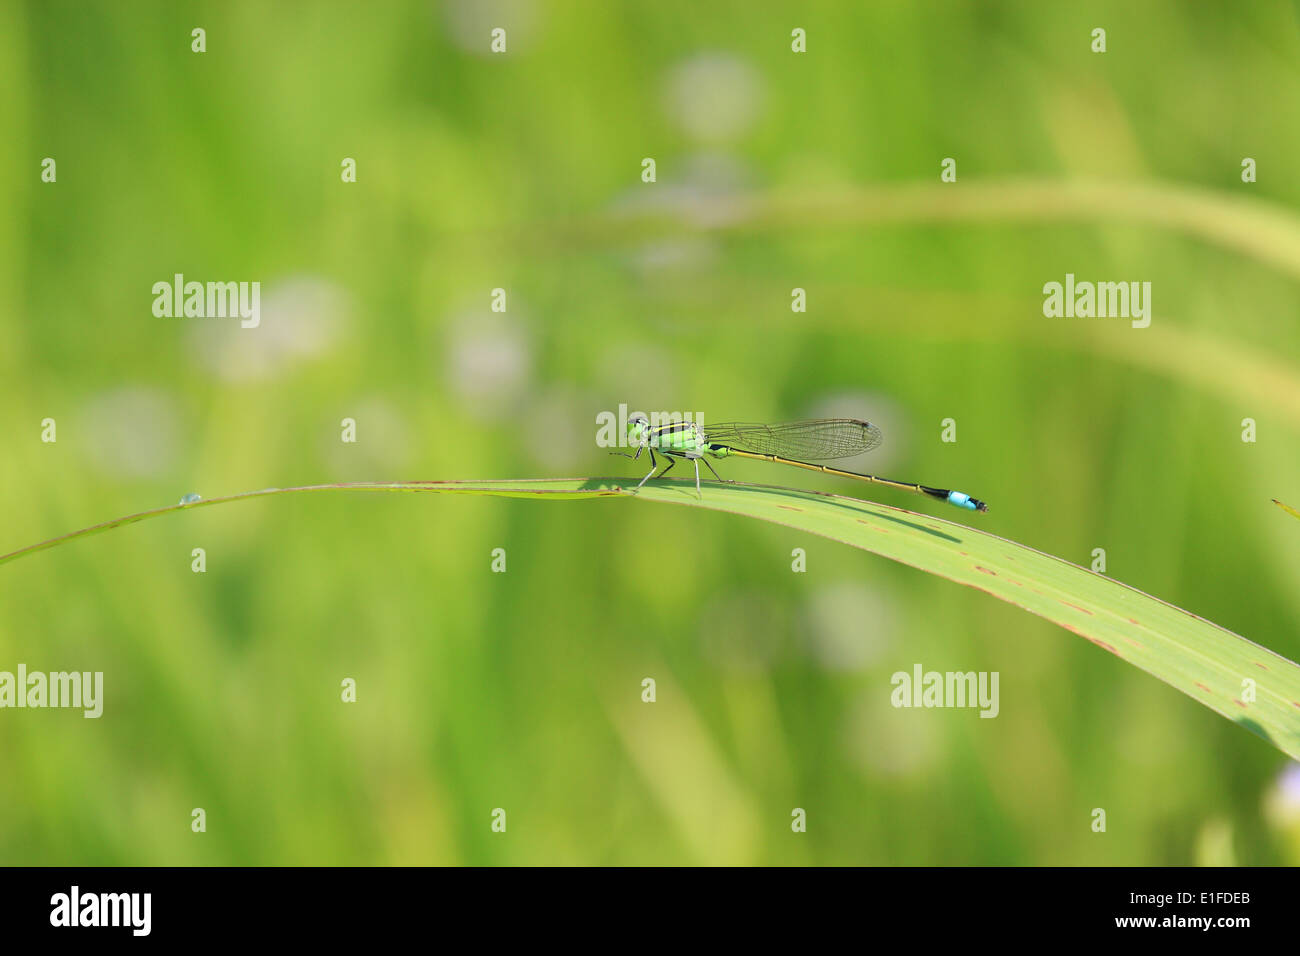 close, up, macro, thailand, asia, focus, Dragonfly, Northern hemisphere - Stock Image